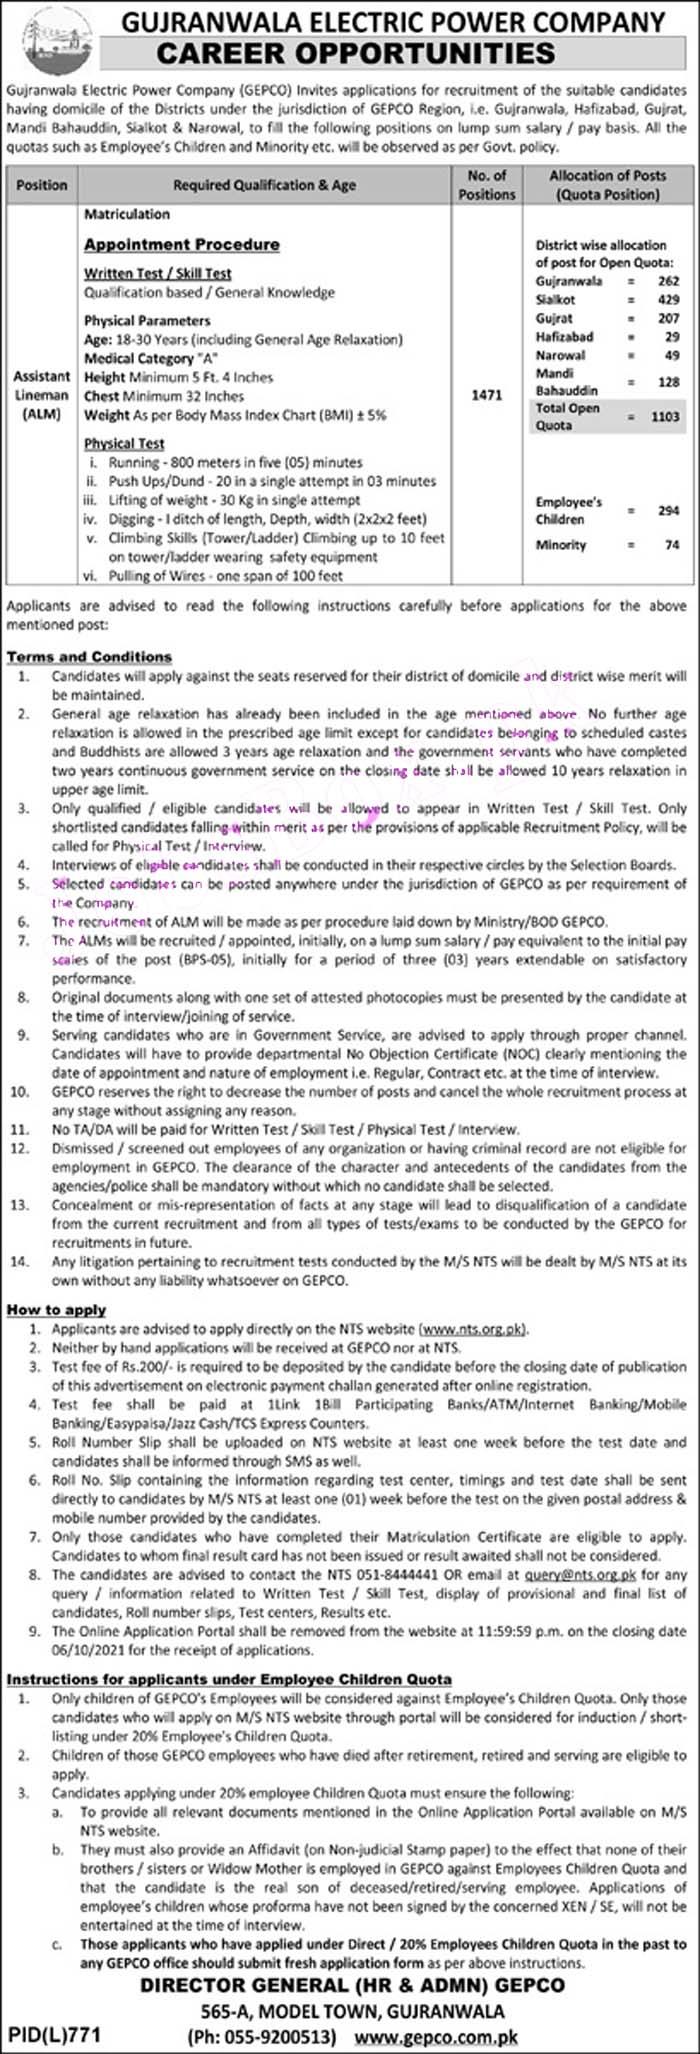 Wapda ALM jobs 2021    New Wapda jobs    latest Wapda jobs 2021   واپڈا نوکریاں 2021